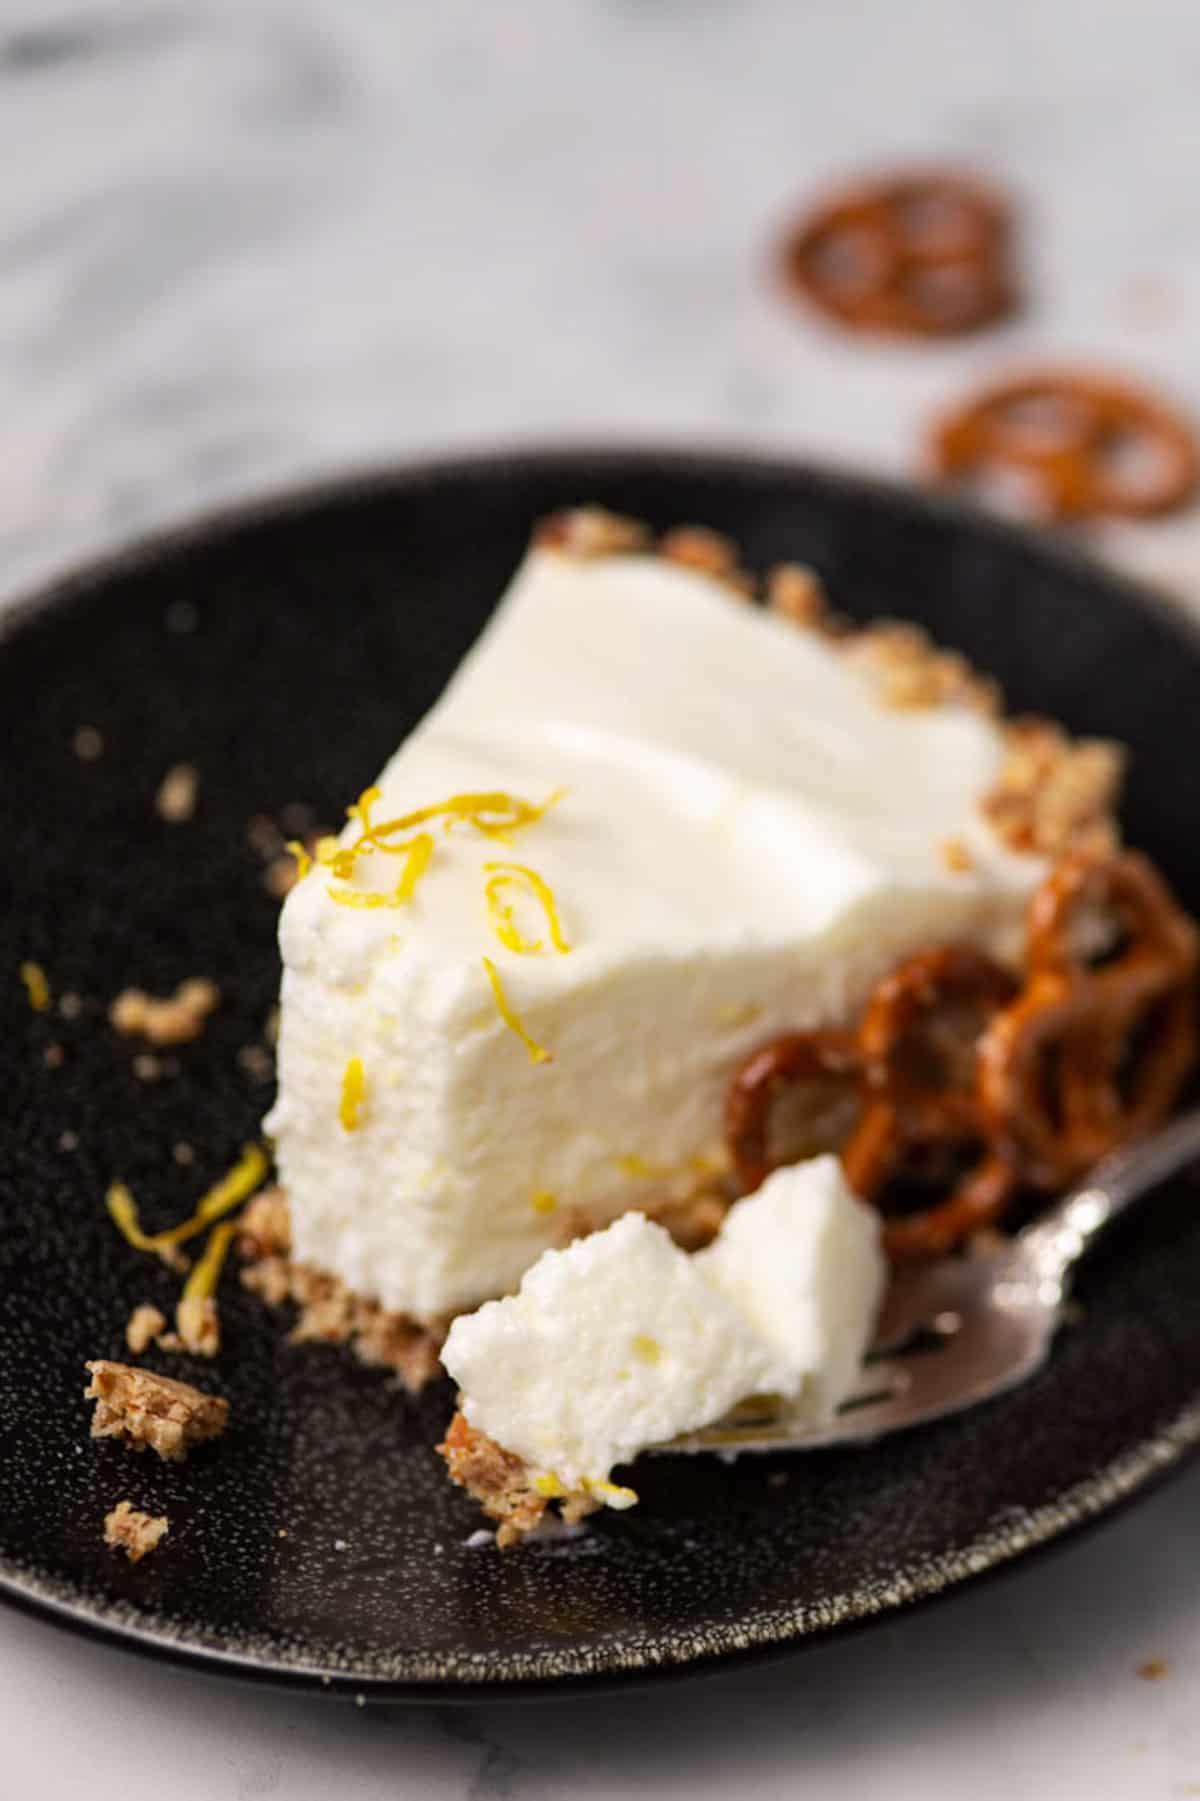 A bite of a lemon chiffon pie on a black plate.